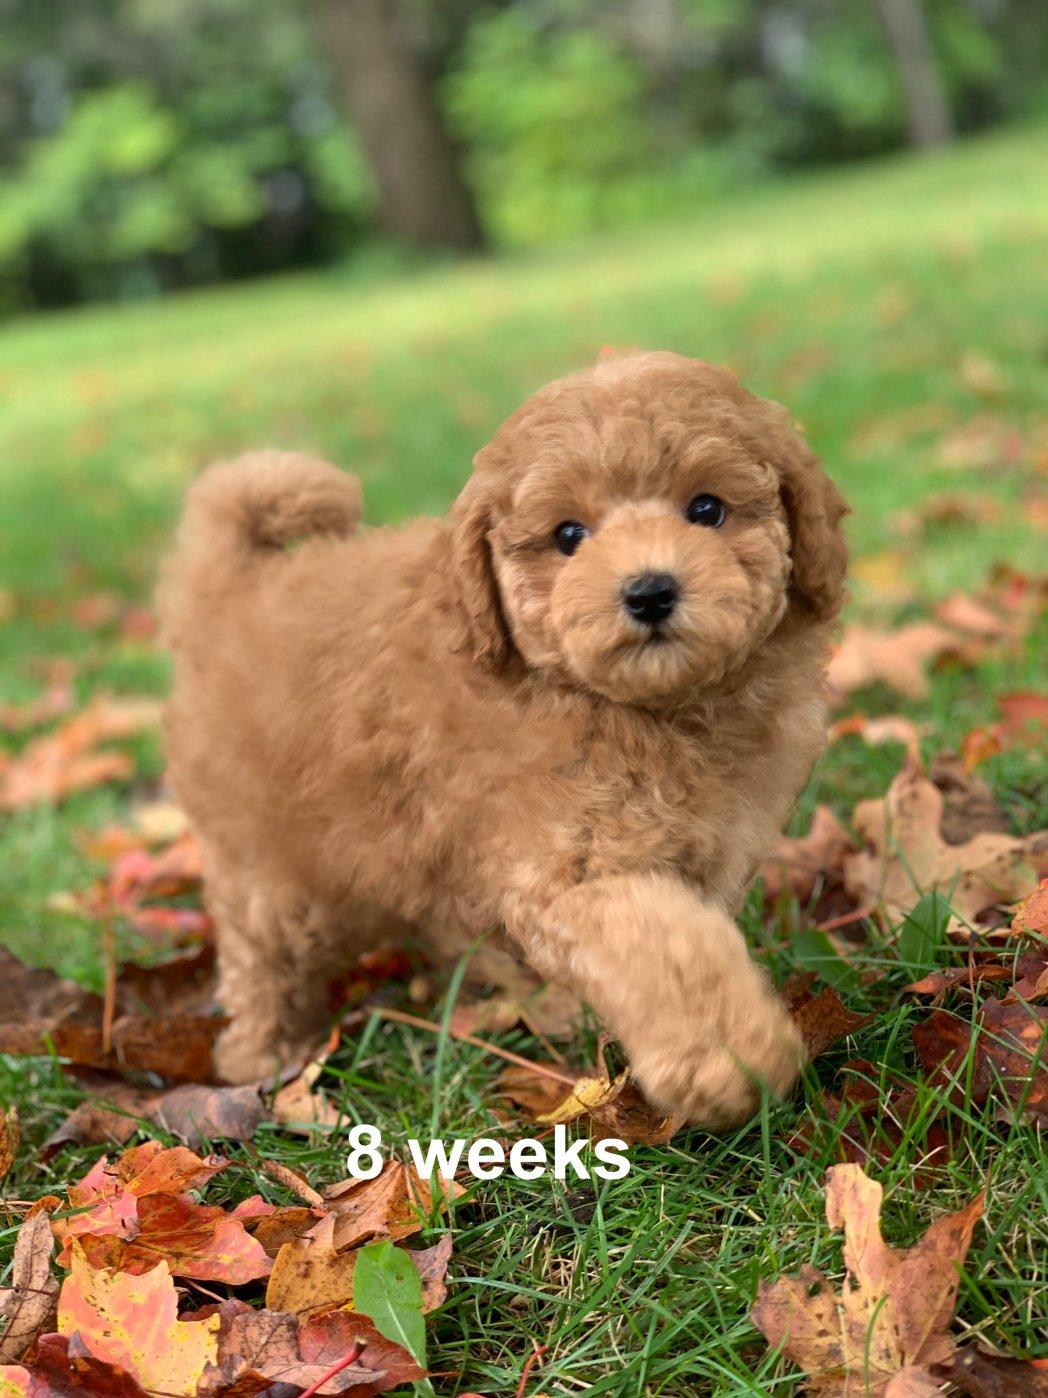 52 weeks of Lacey Rose-9f5ac6fb-5577-429d-96f6-c5e59c47ed94.jpg